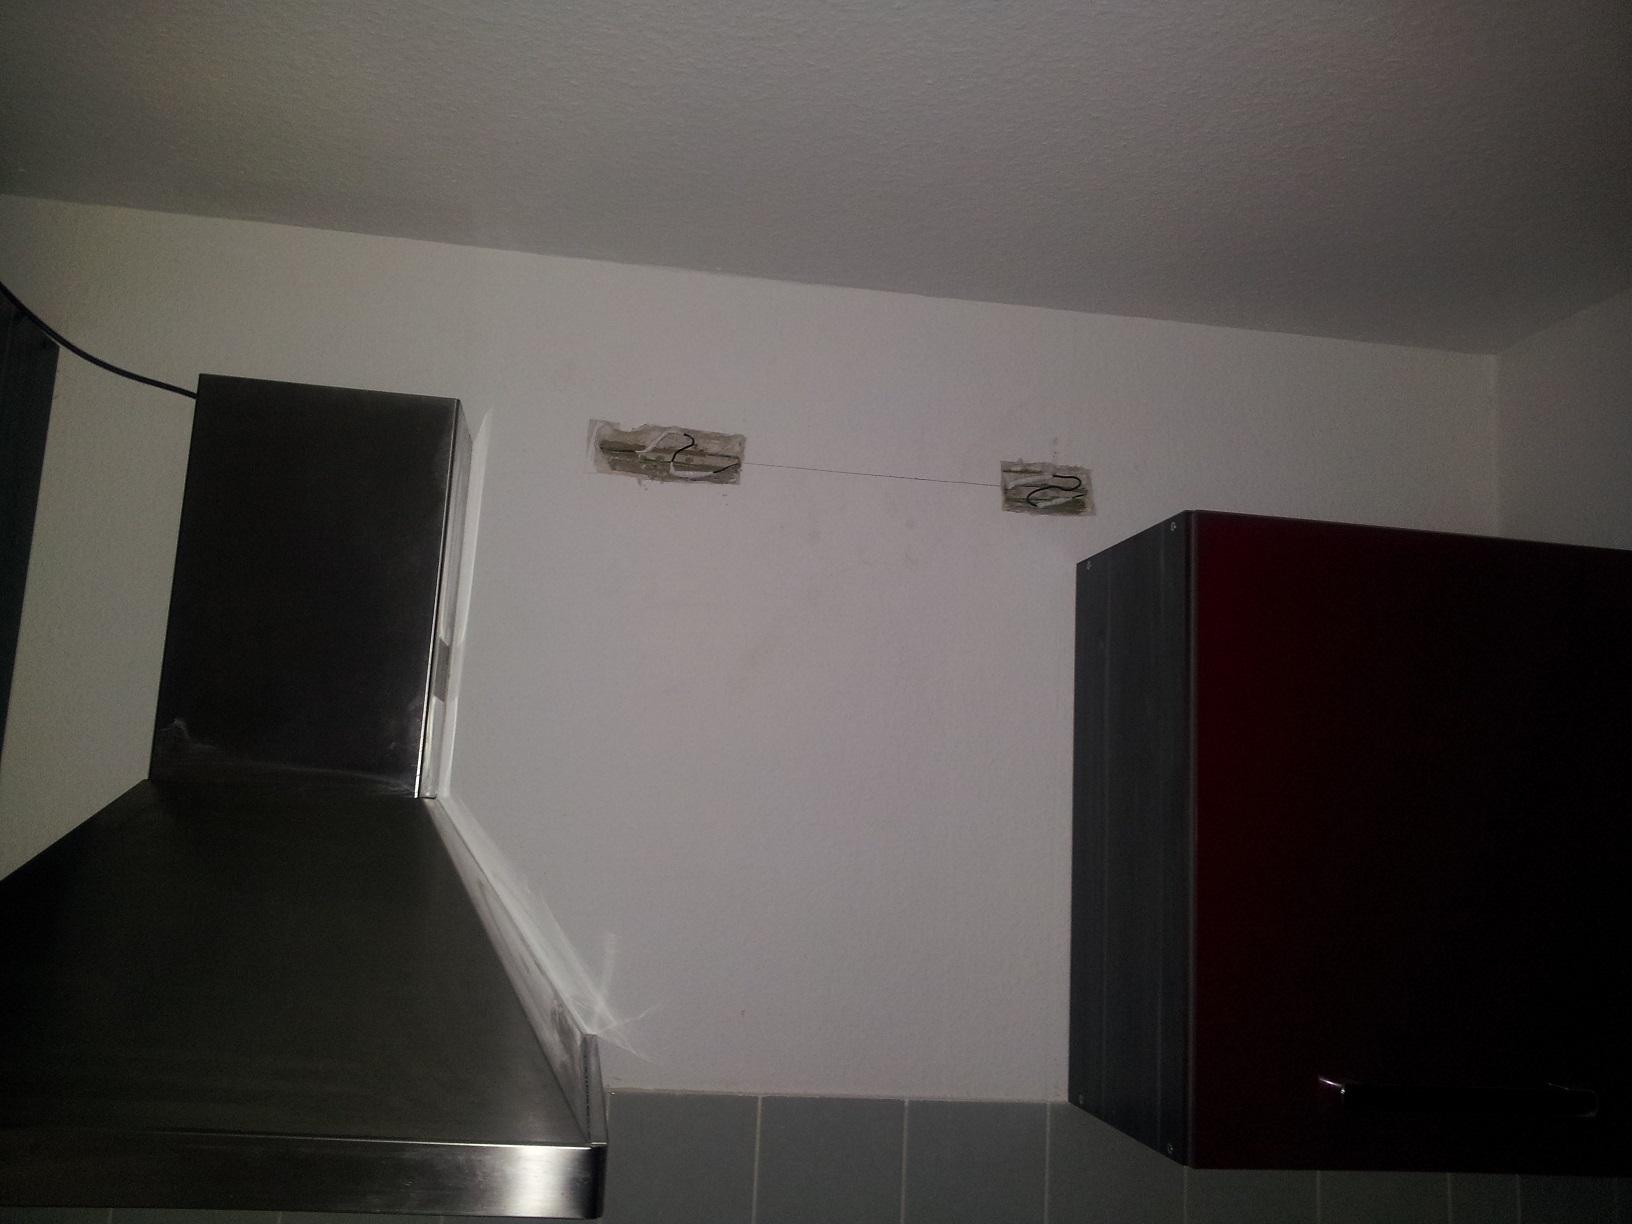 Kabel in Küche bei Hängeschränke aufhängen angebohrt (Mietrecht ...